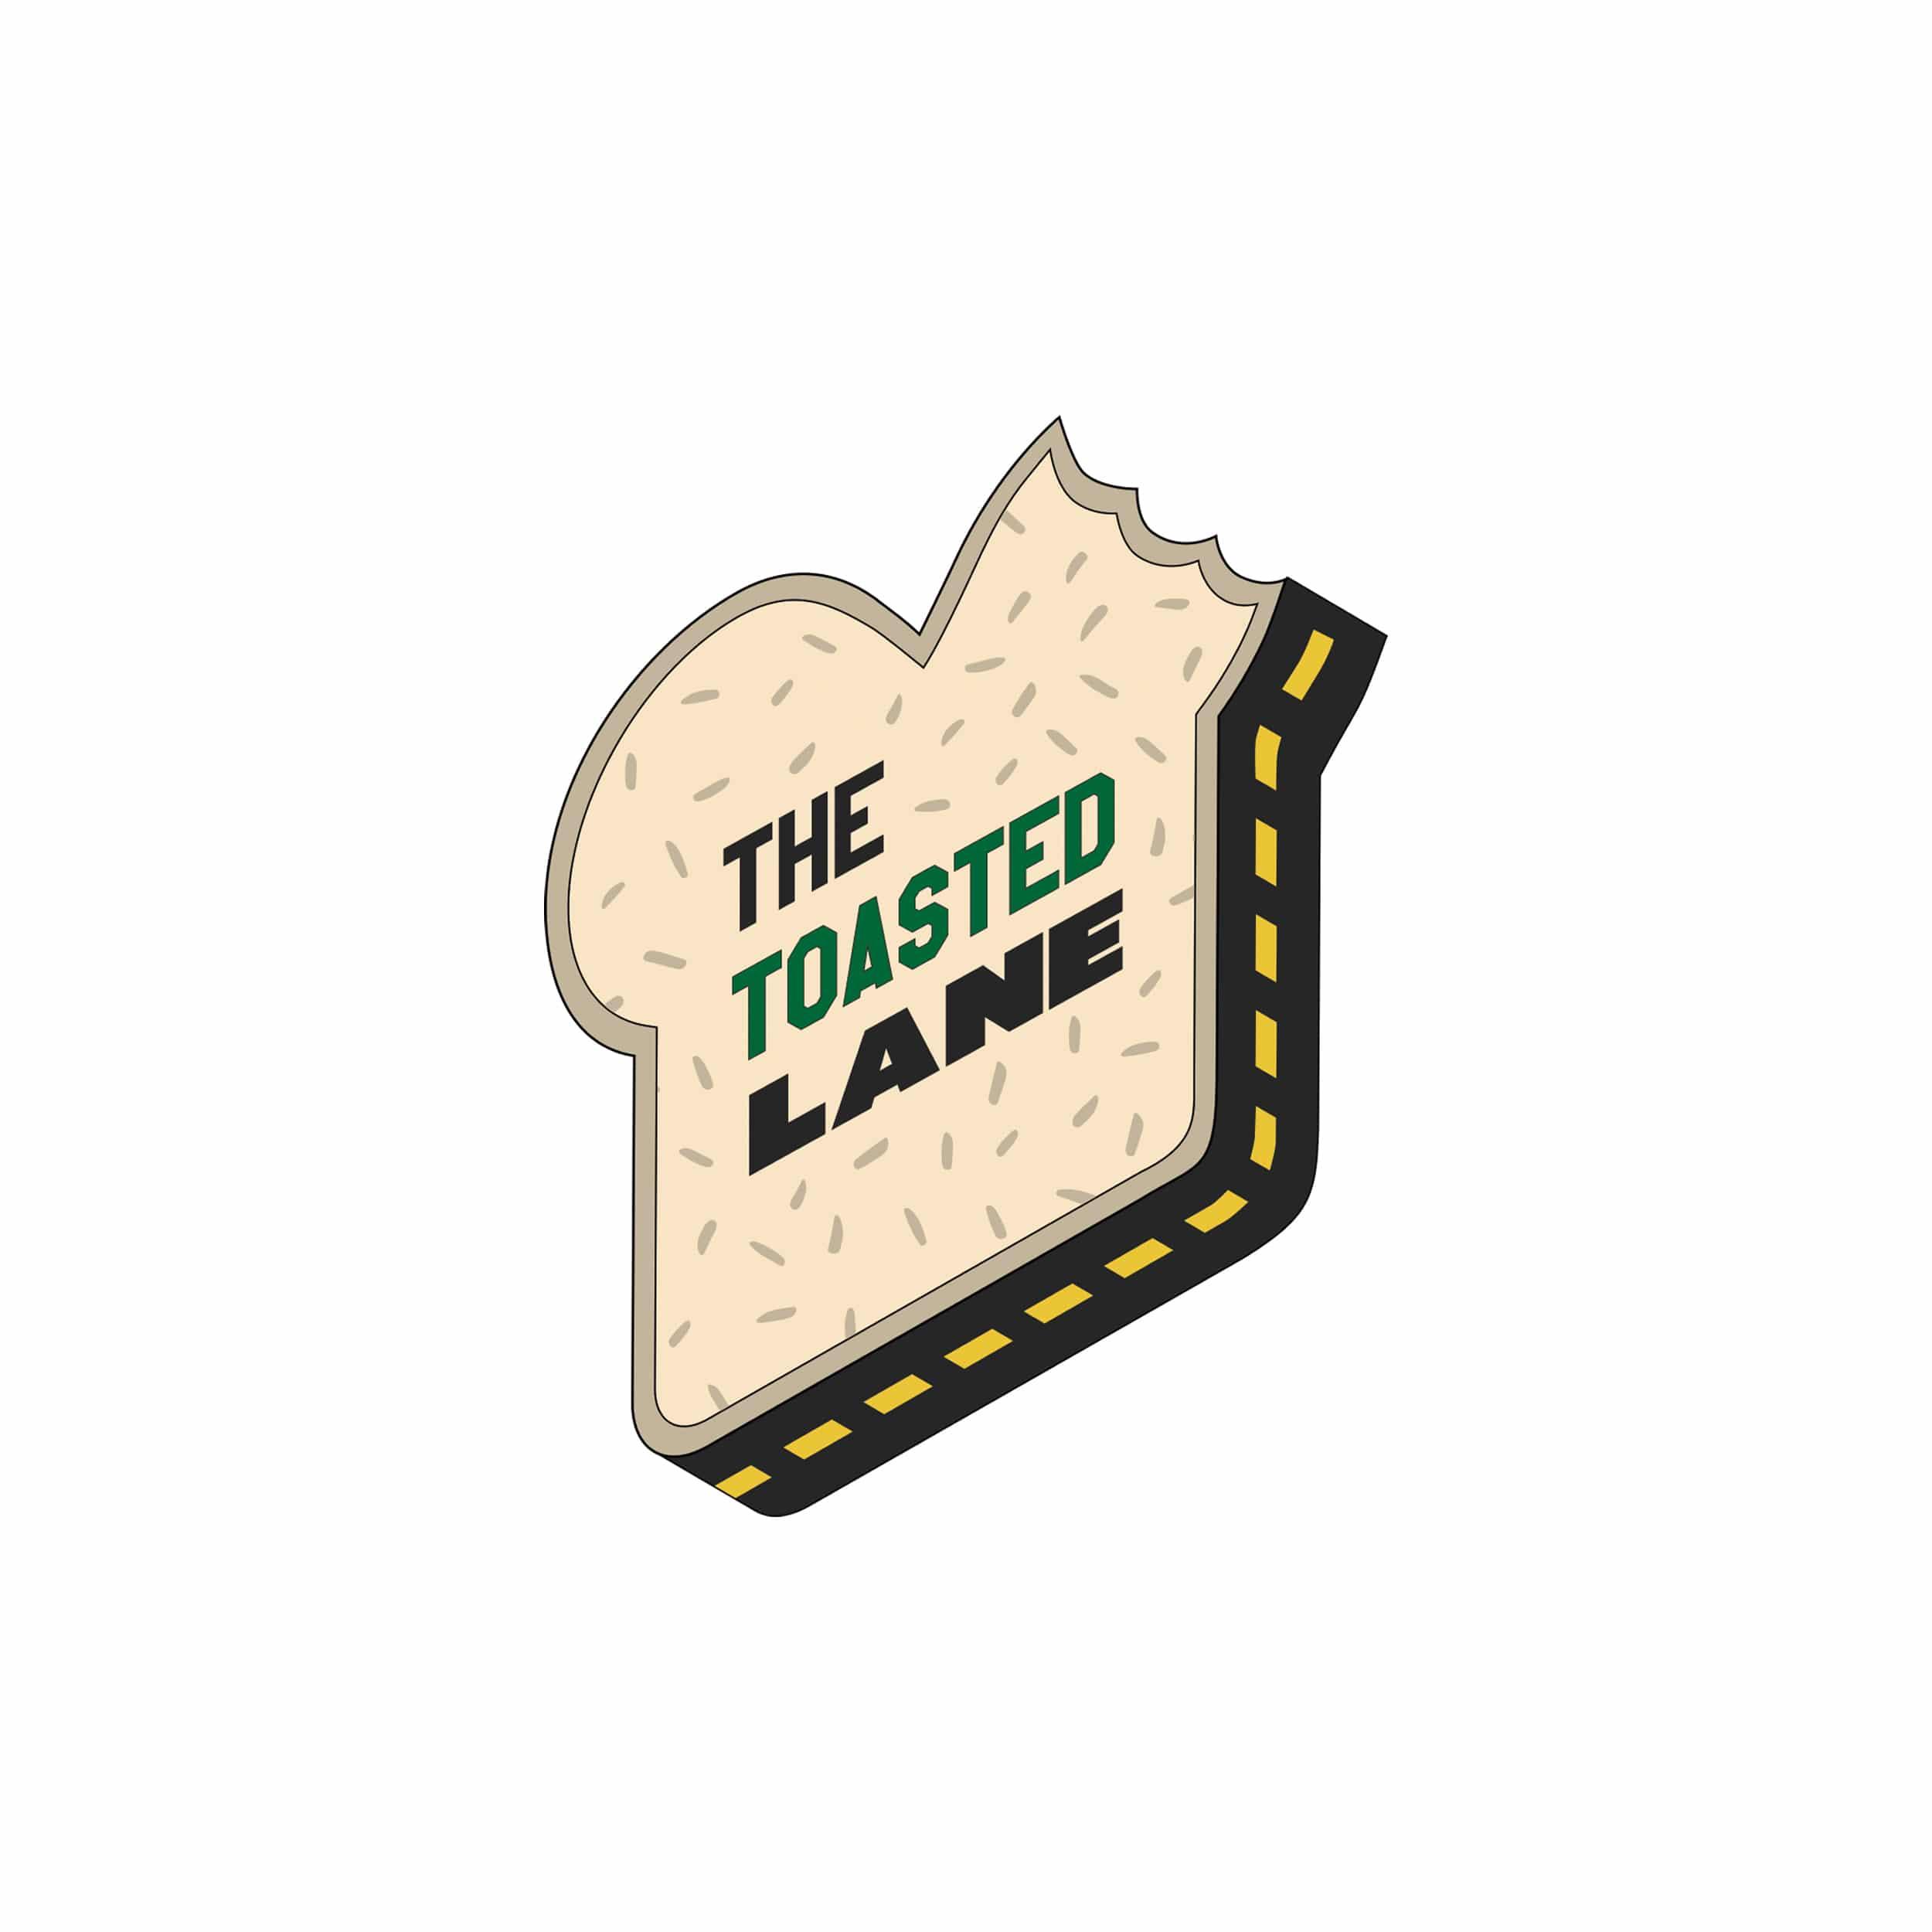 karla-moy-the-toasted-lane3